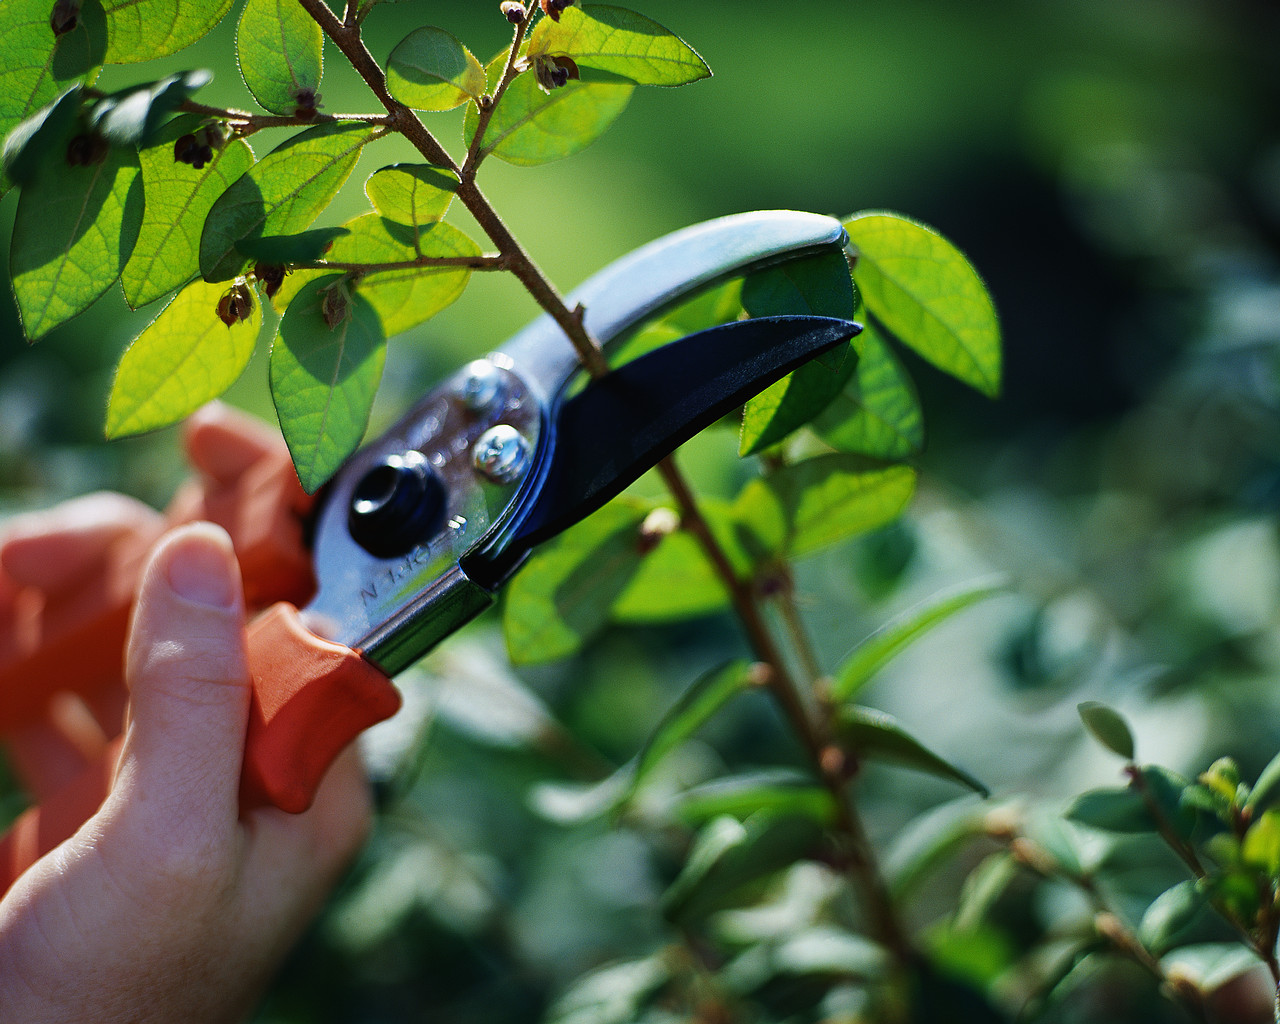 Image of pruning shears